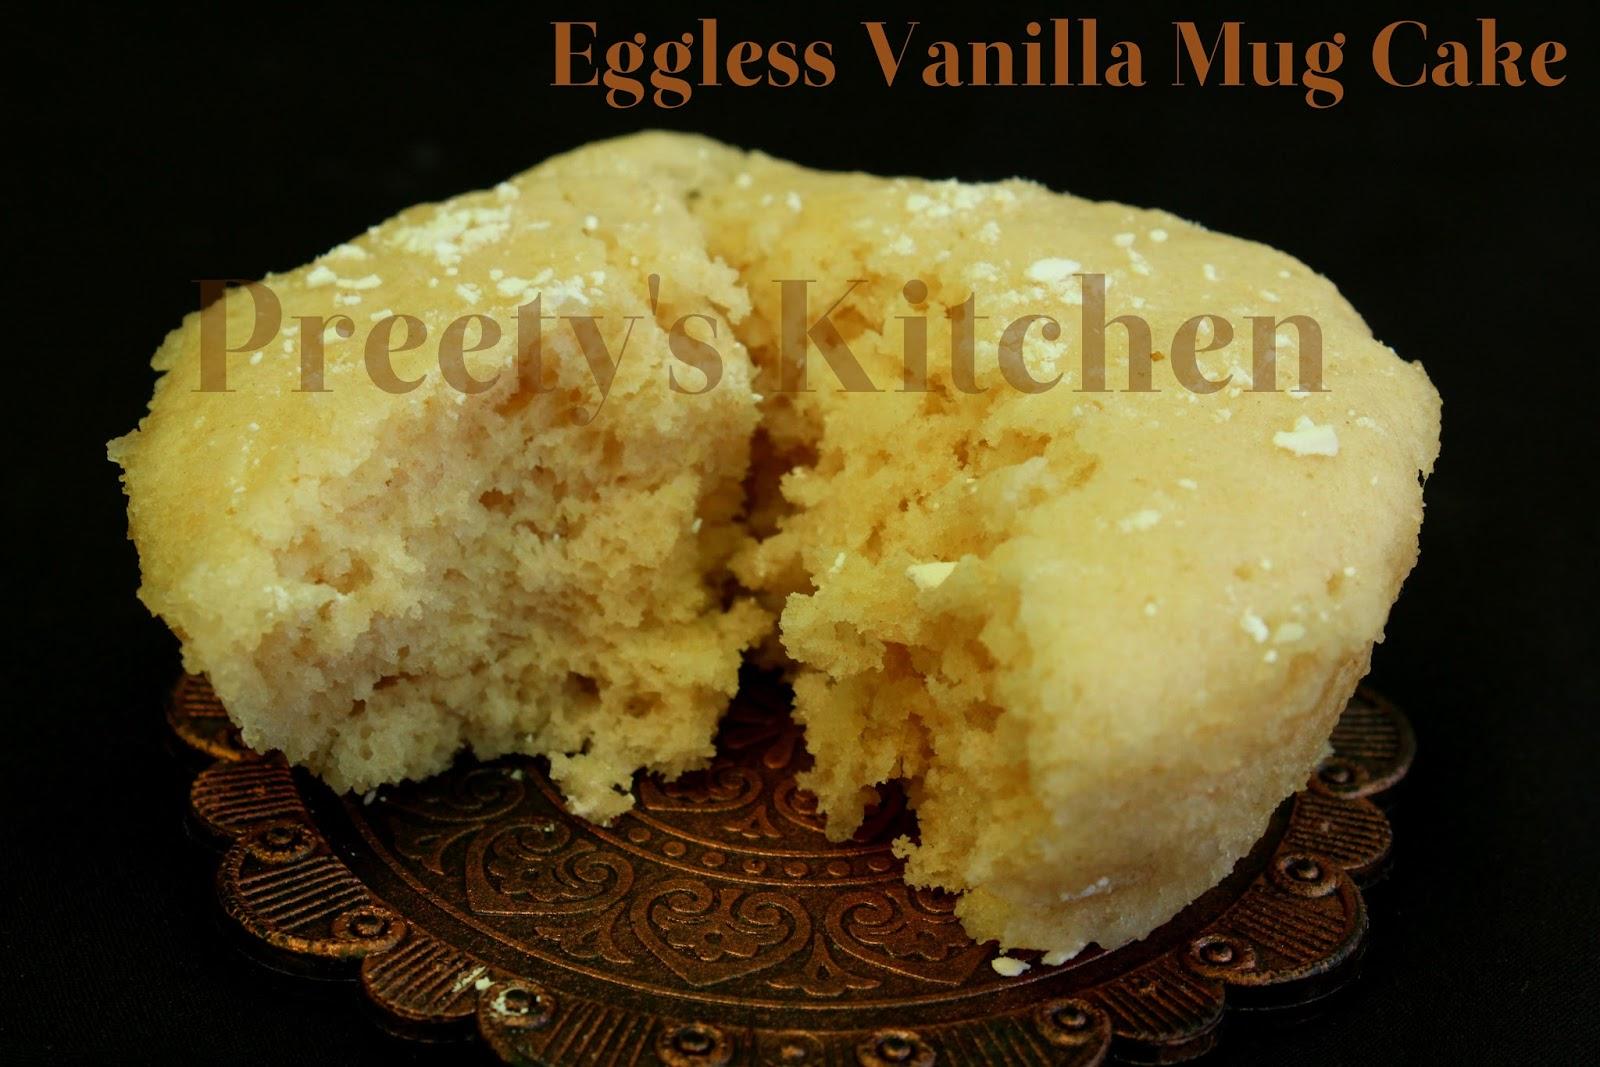 Microwave Vanilla Cake Recipes In A Mug: Preety's Kitchen: Eggless Vanilla Mug Cake / Single